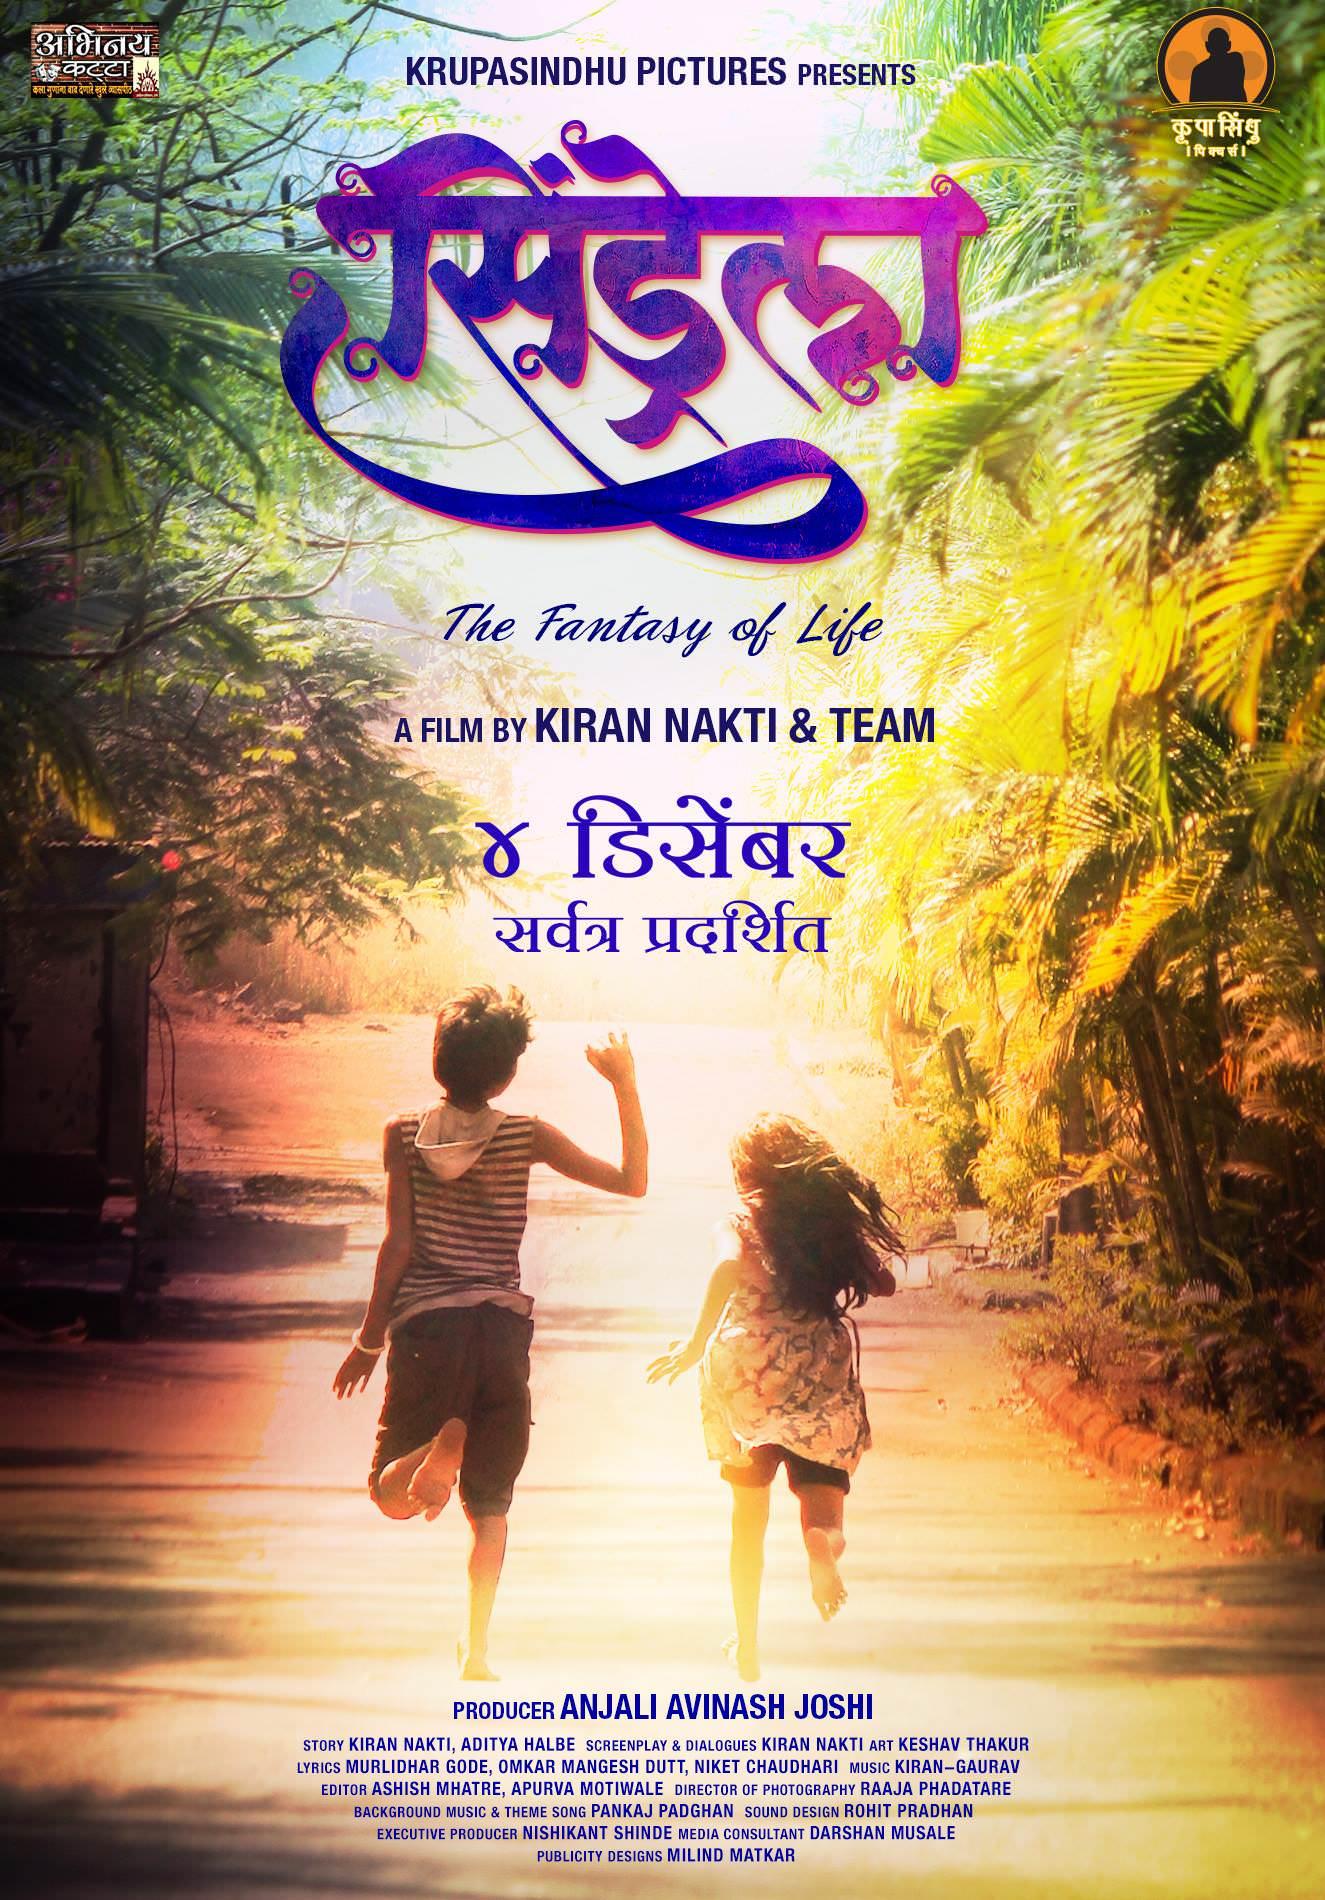 cindrella marathi movie cast release date trailer actress